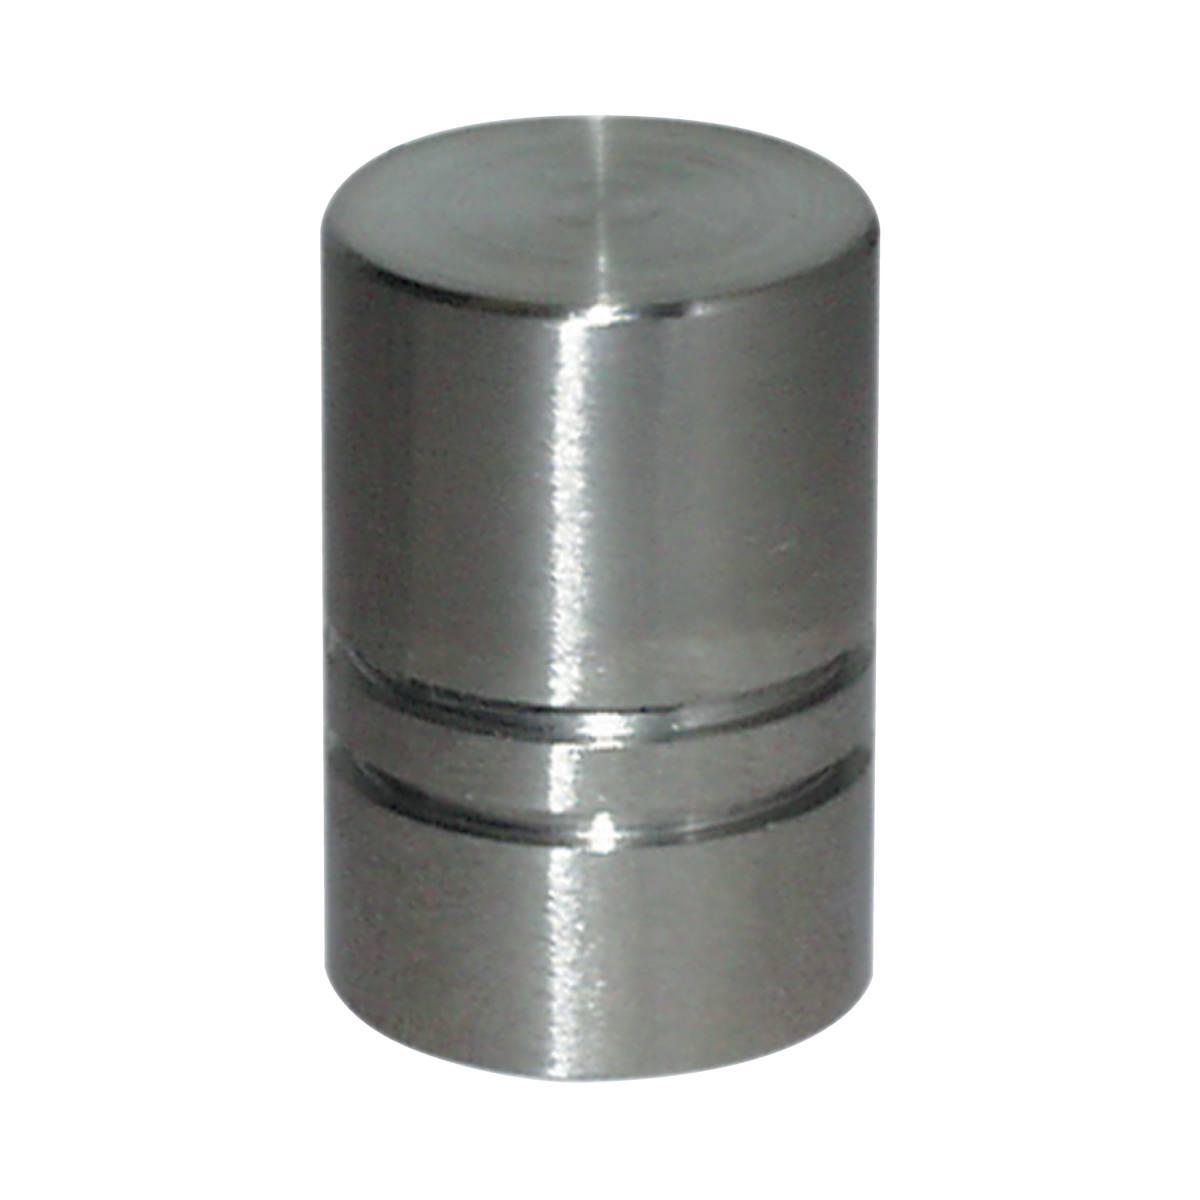 BOUTON CYLINDRIQUE EN INOX Ø 18 MM